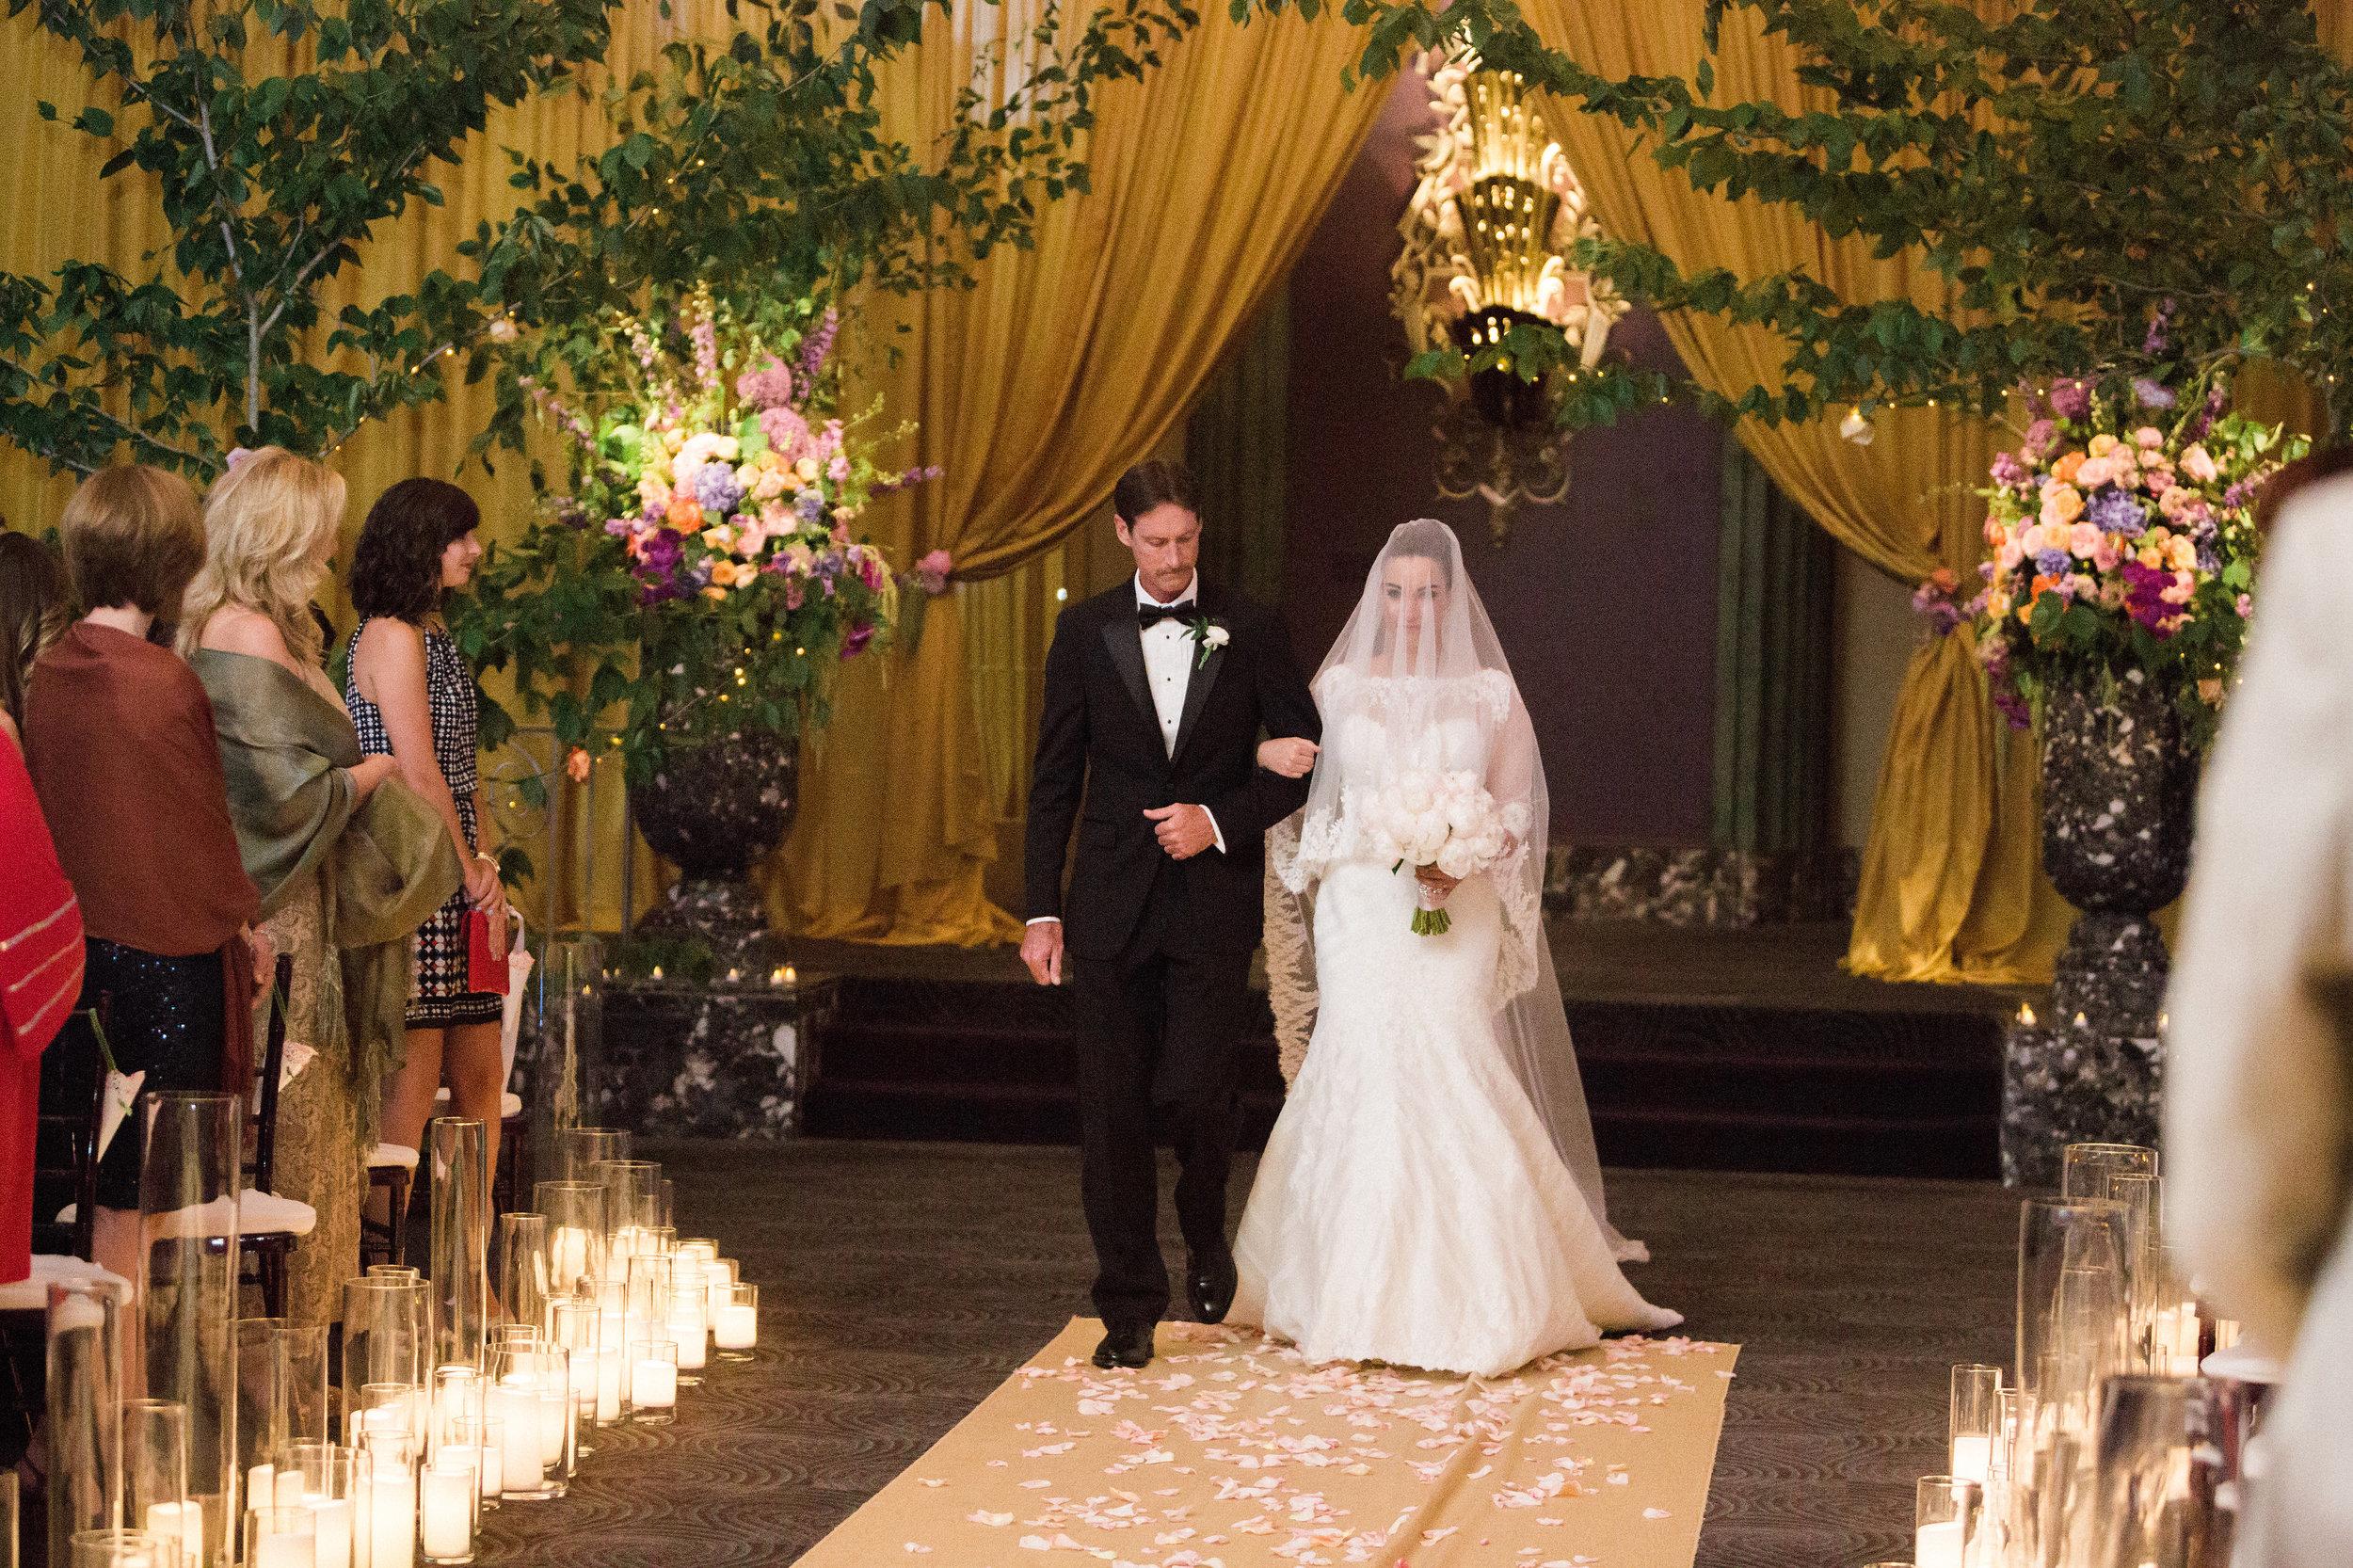 Bride walking down the aisle at The Hilton Netherland Plaza Hotel Continental Room Cincinnati, OH